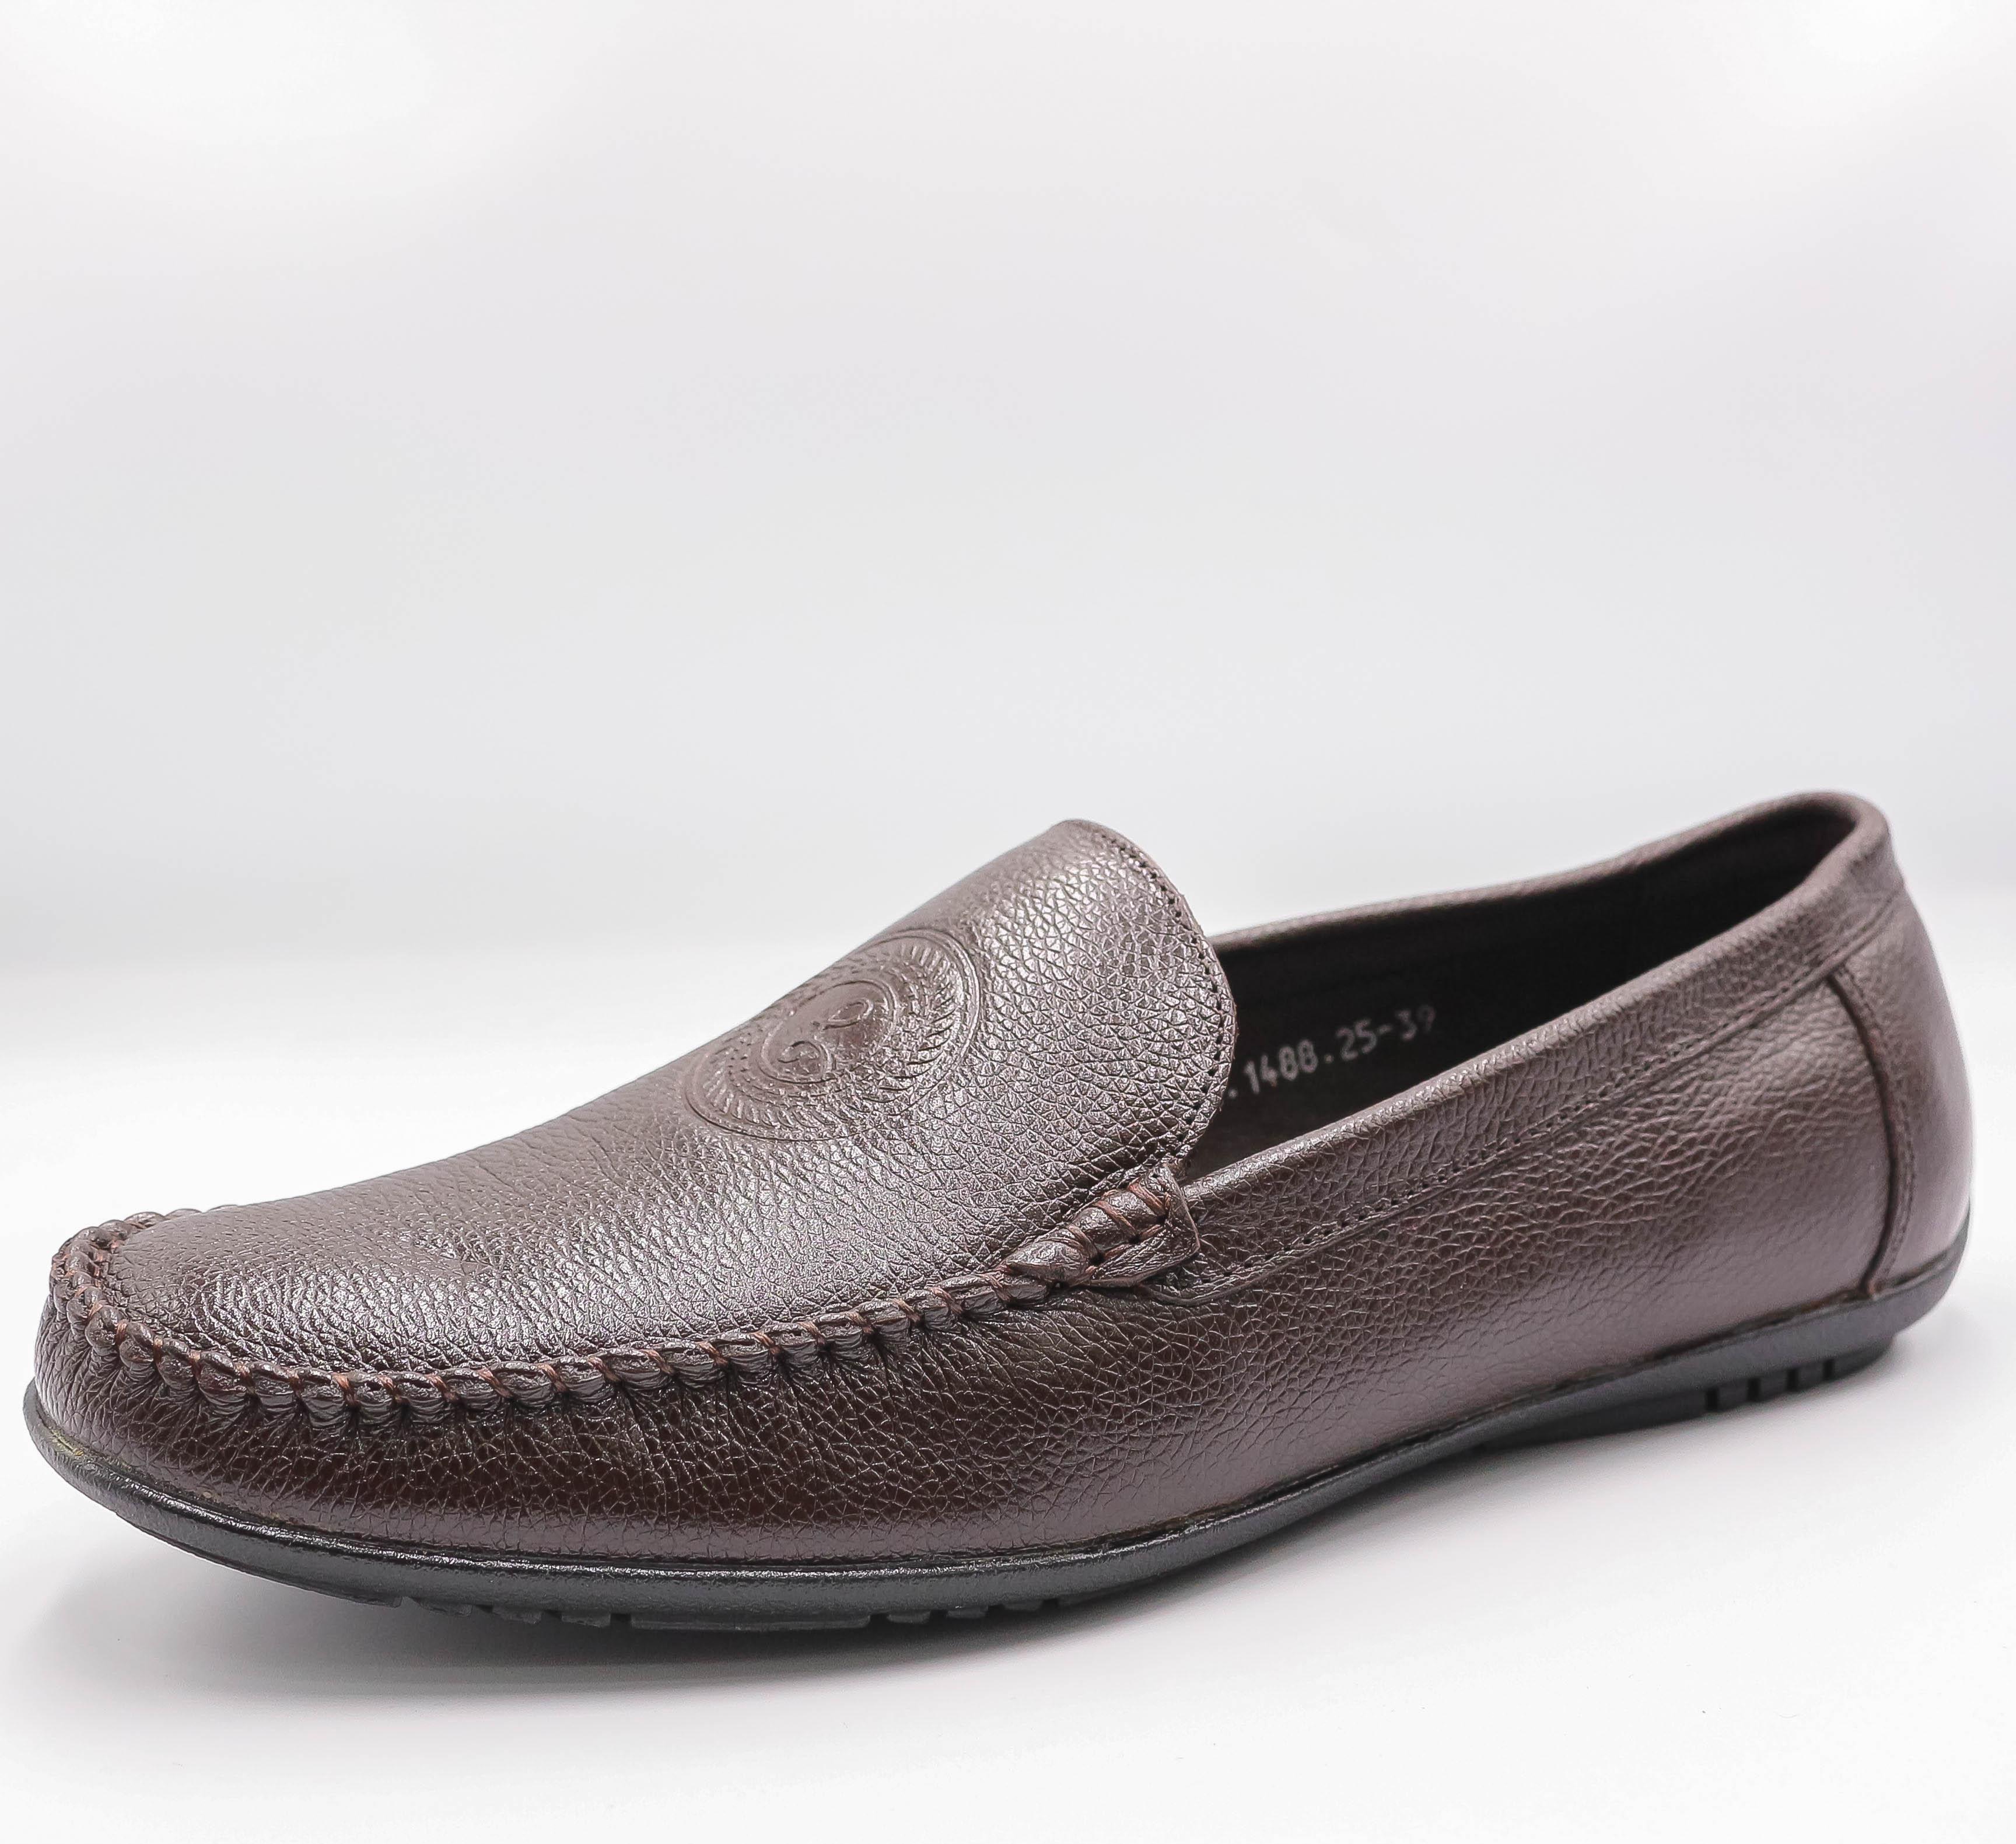 Giày Tây nam da bò cao cấp - 5VTU010 - SMG Shoes